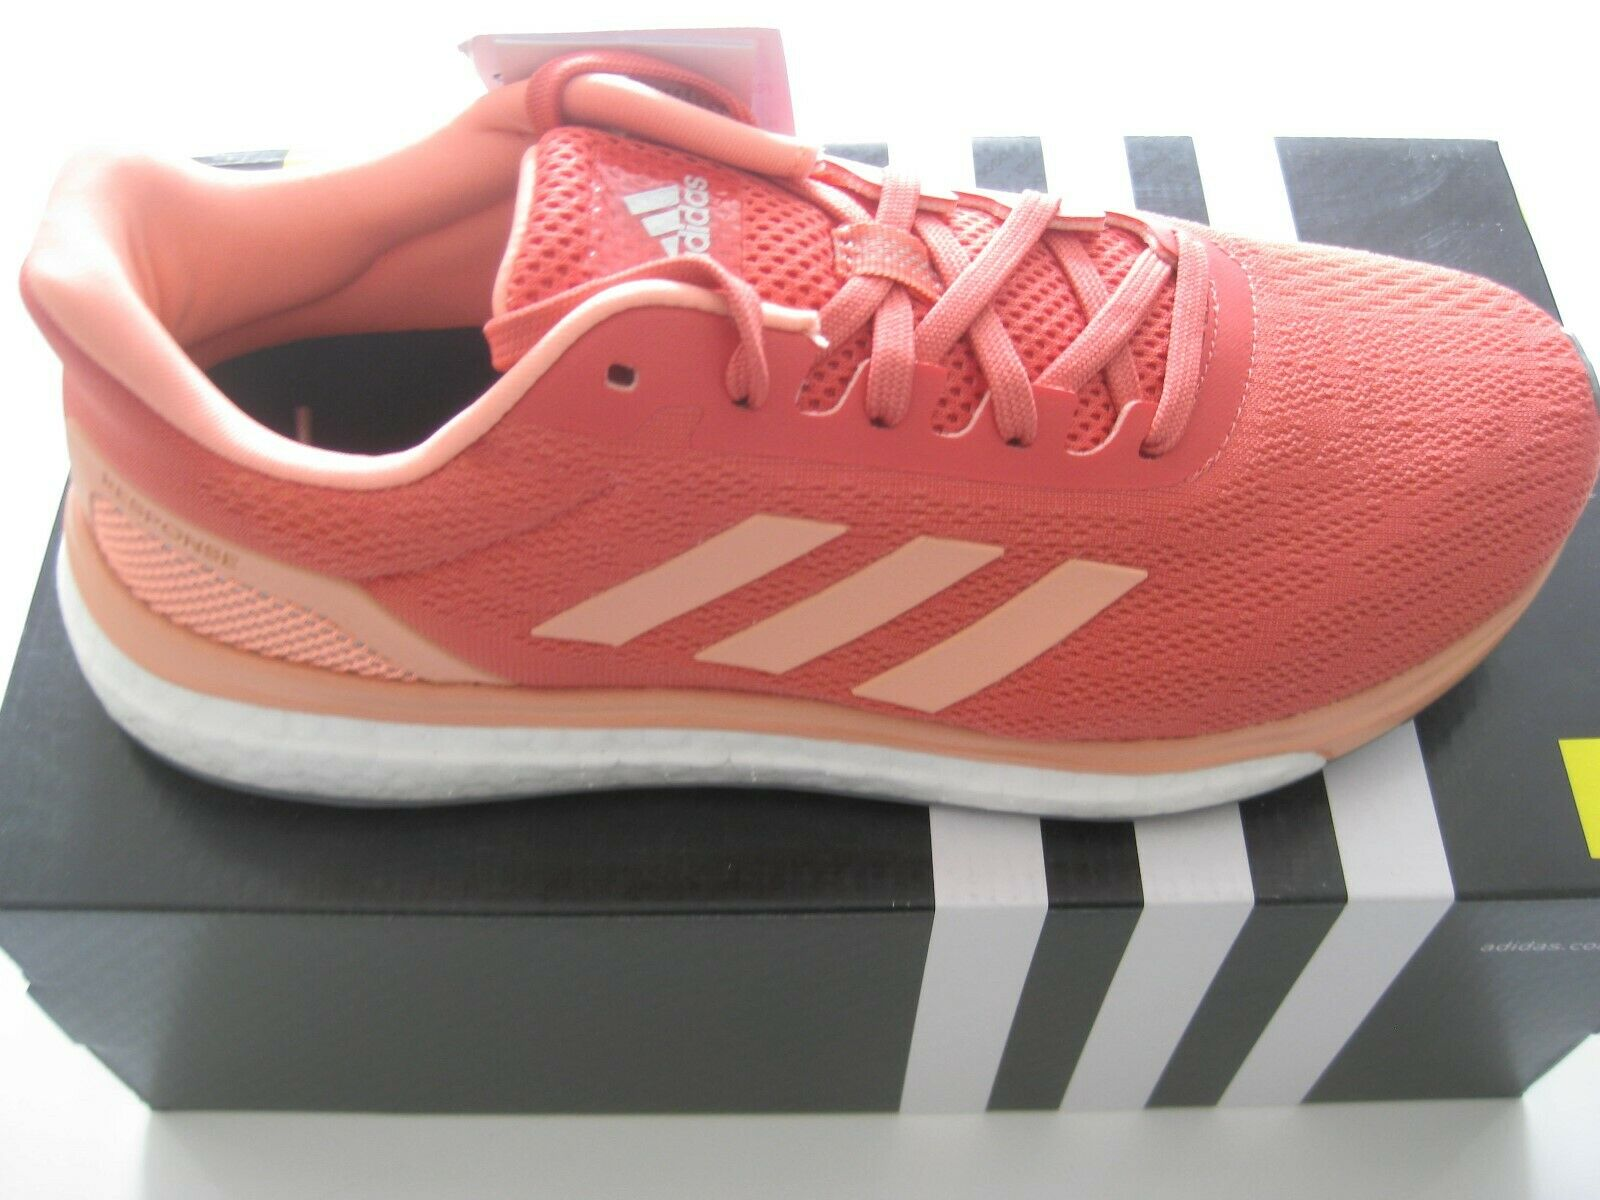 c4c5130757 ADIDAS Laufschuhe Schuhe Responce W DB0882 Gr. 40 2 3 coral rot +++ NEU  nppsek4554-Damen